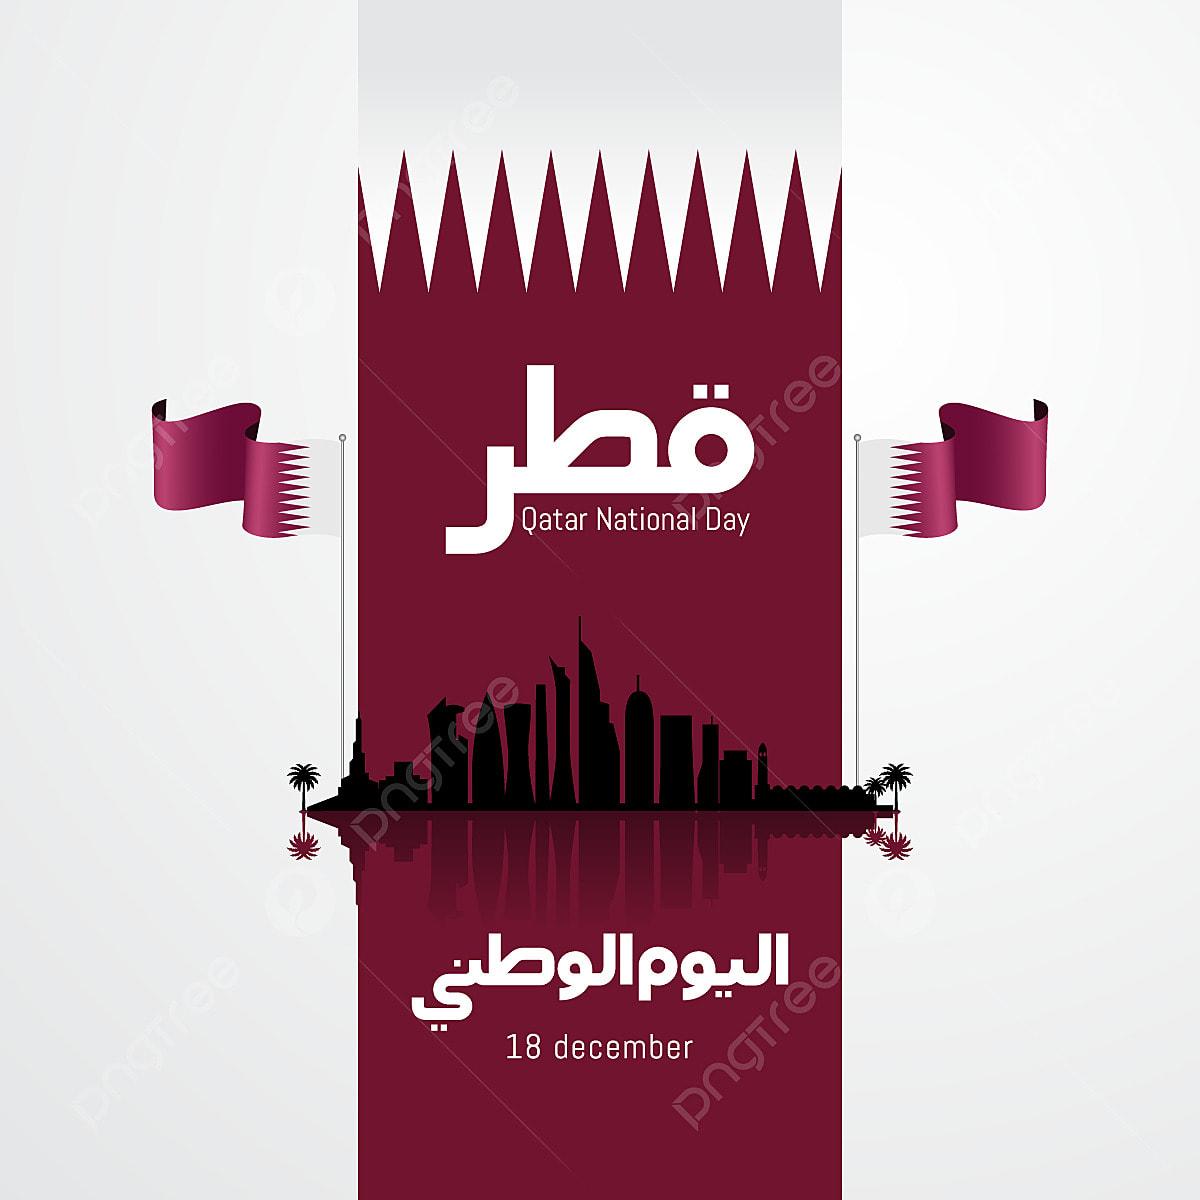 Qatar National Day Celebration With Landmark And Flag, Qatar